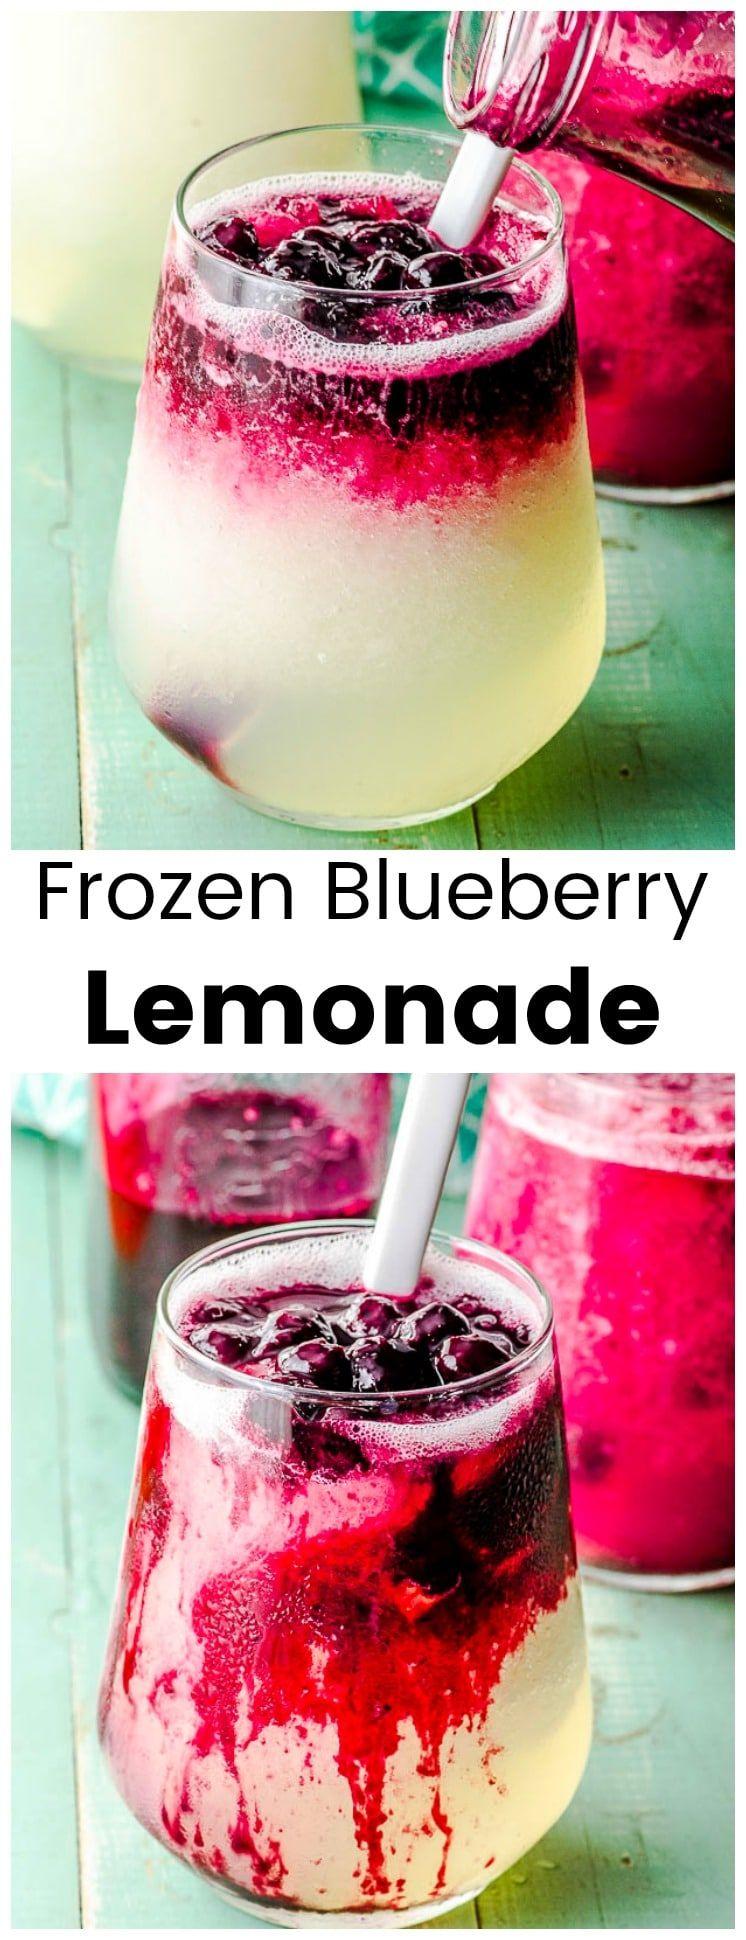 Frozen Blueberry lemonade Recipe Blueberry lemonade